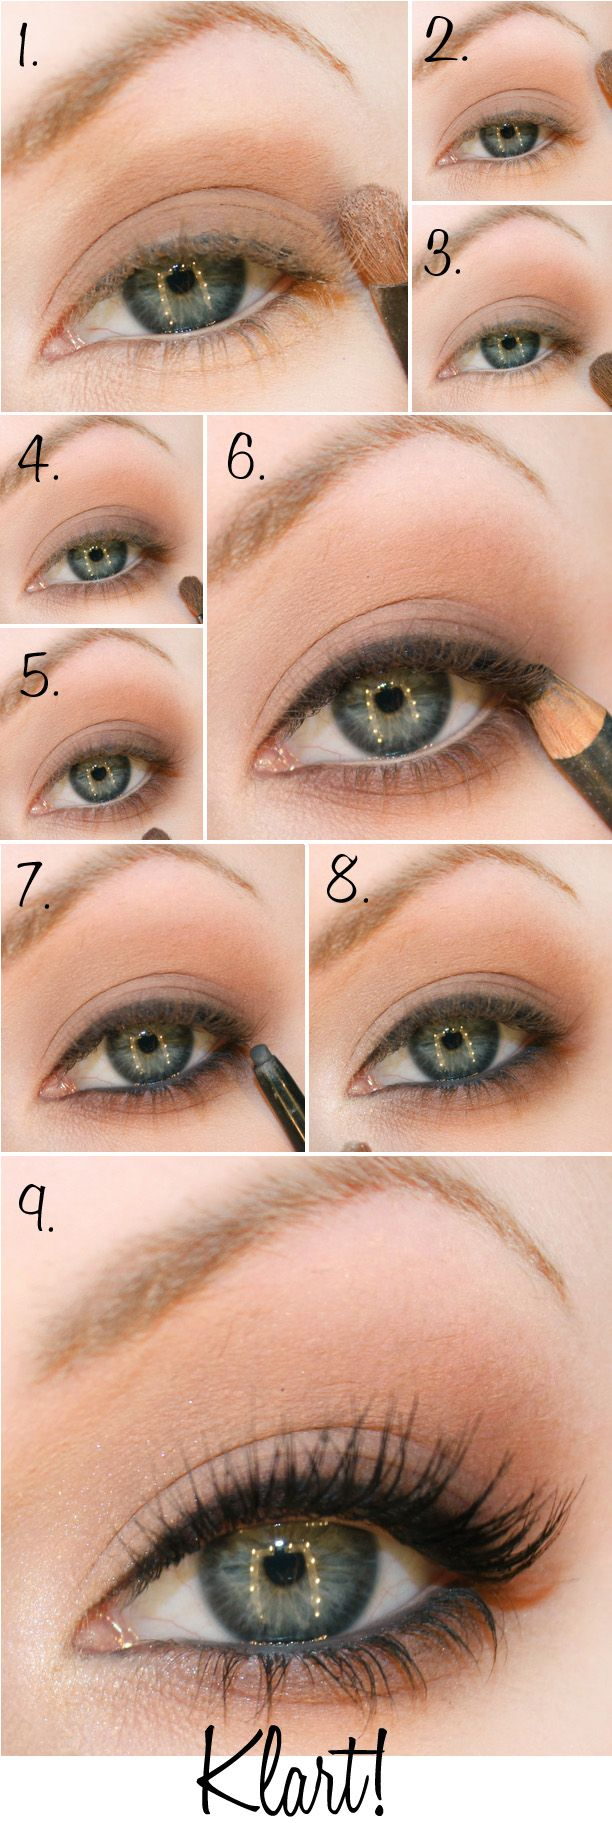 Keira Knightley Makeup Tutorial